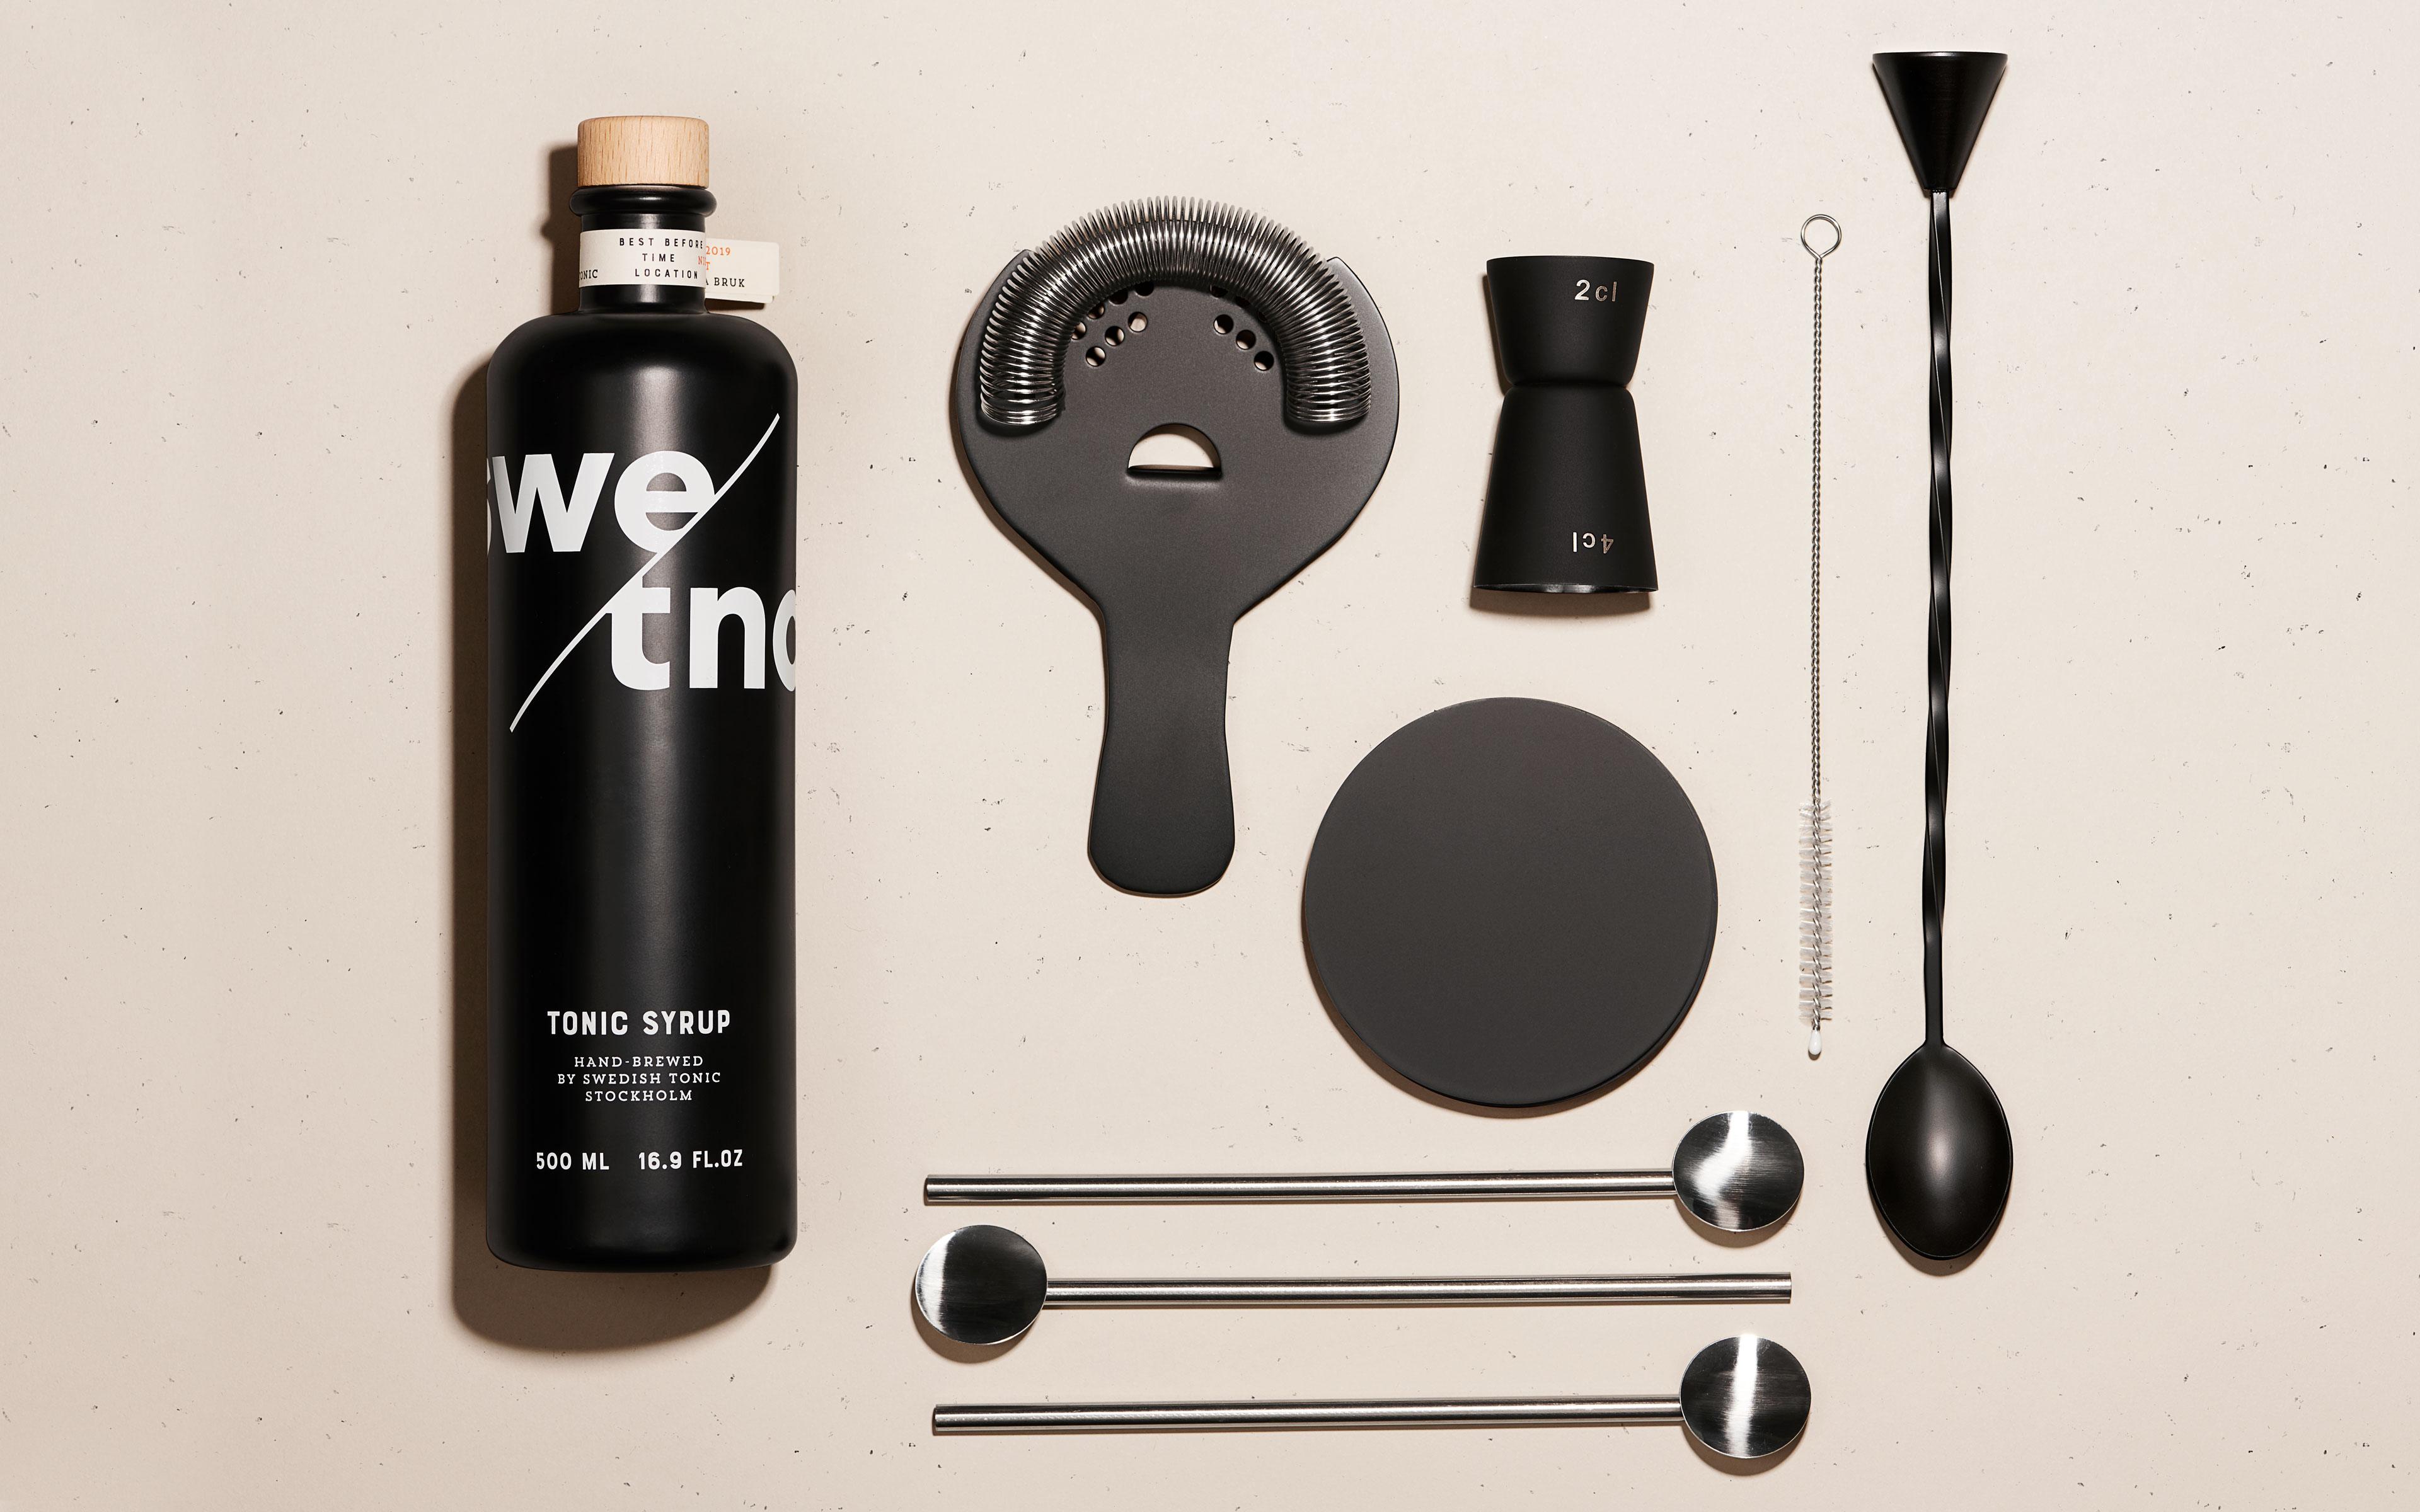 Pond Design Swe Tnc Swedish Tonic Syrup World Brand Design